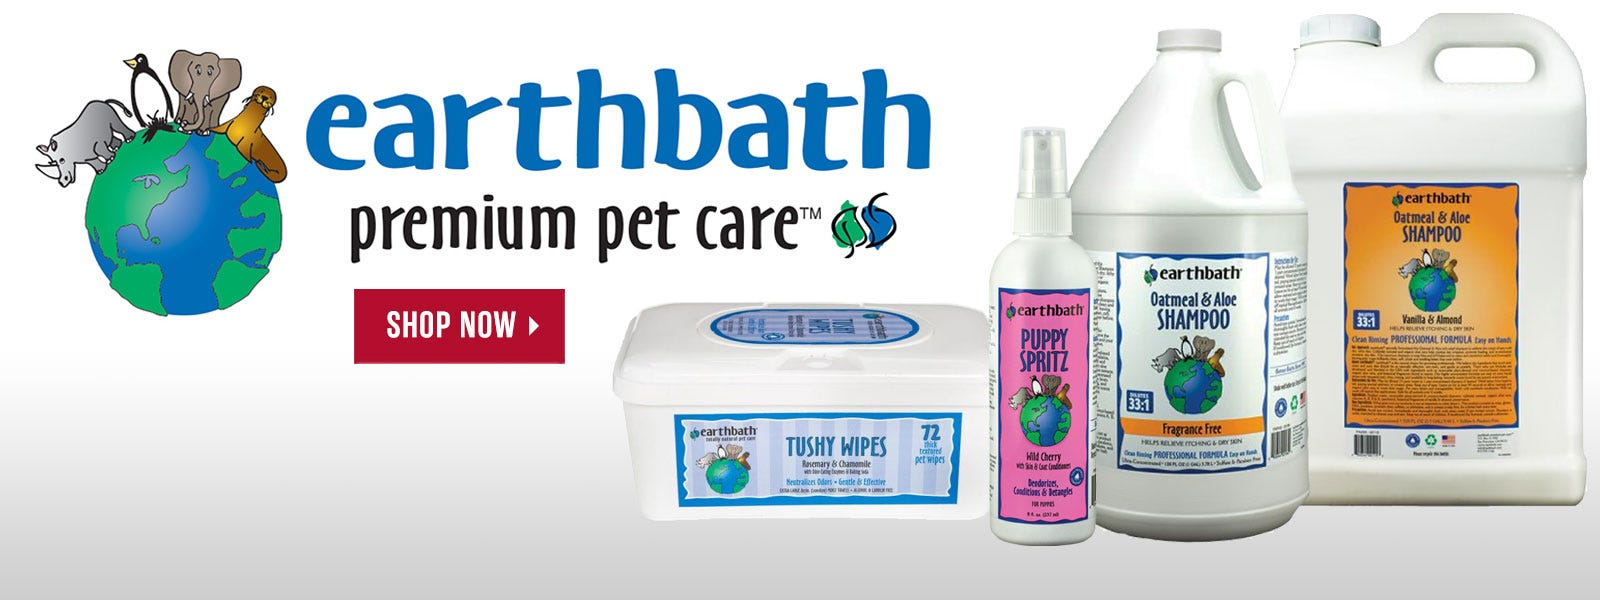 Earthbath shampoos from Earthwhile Endeavors